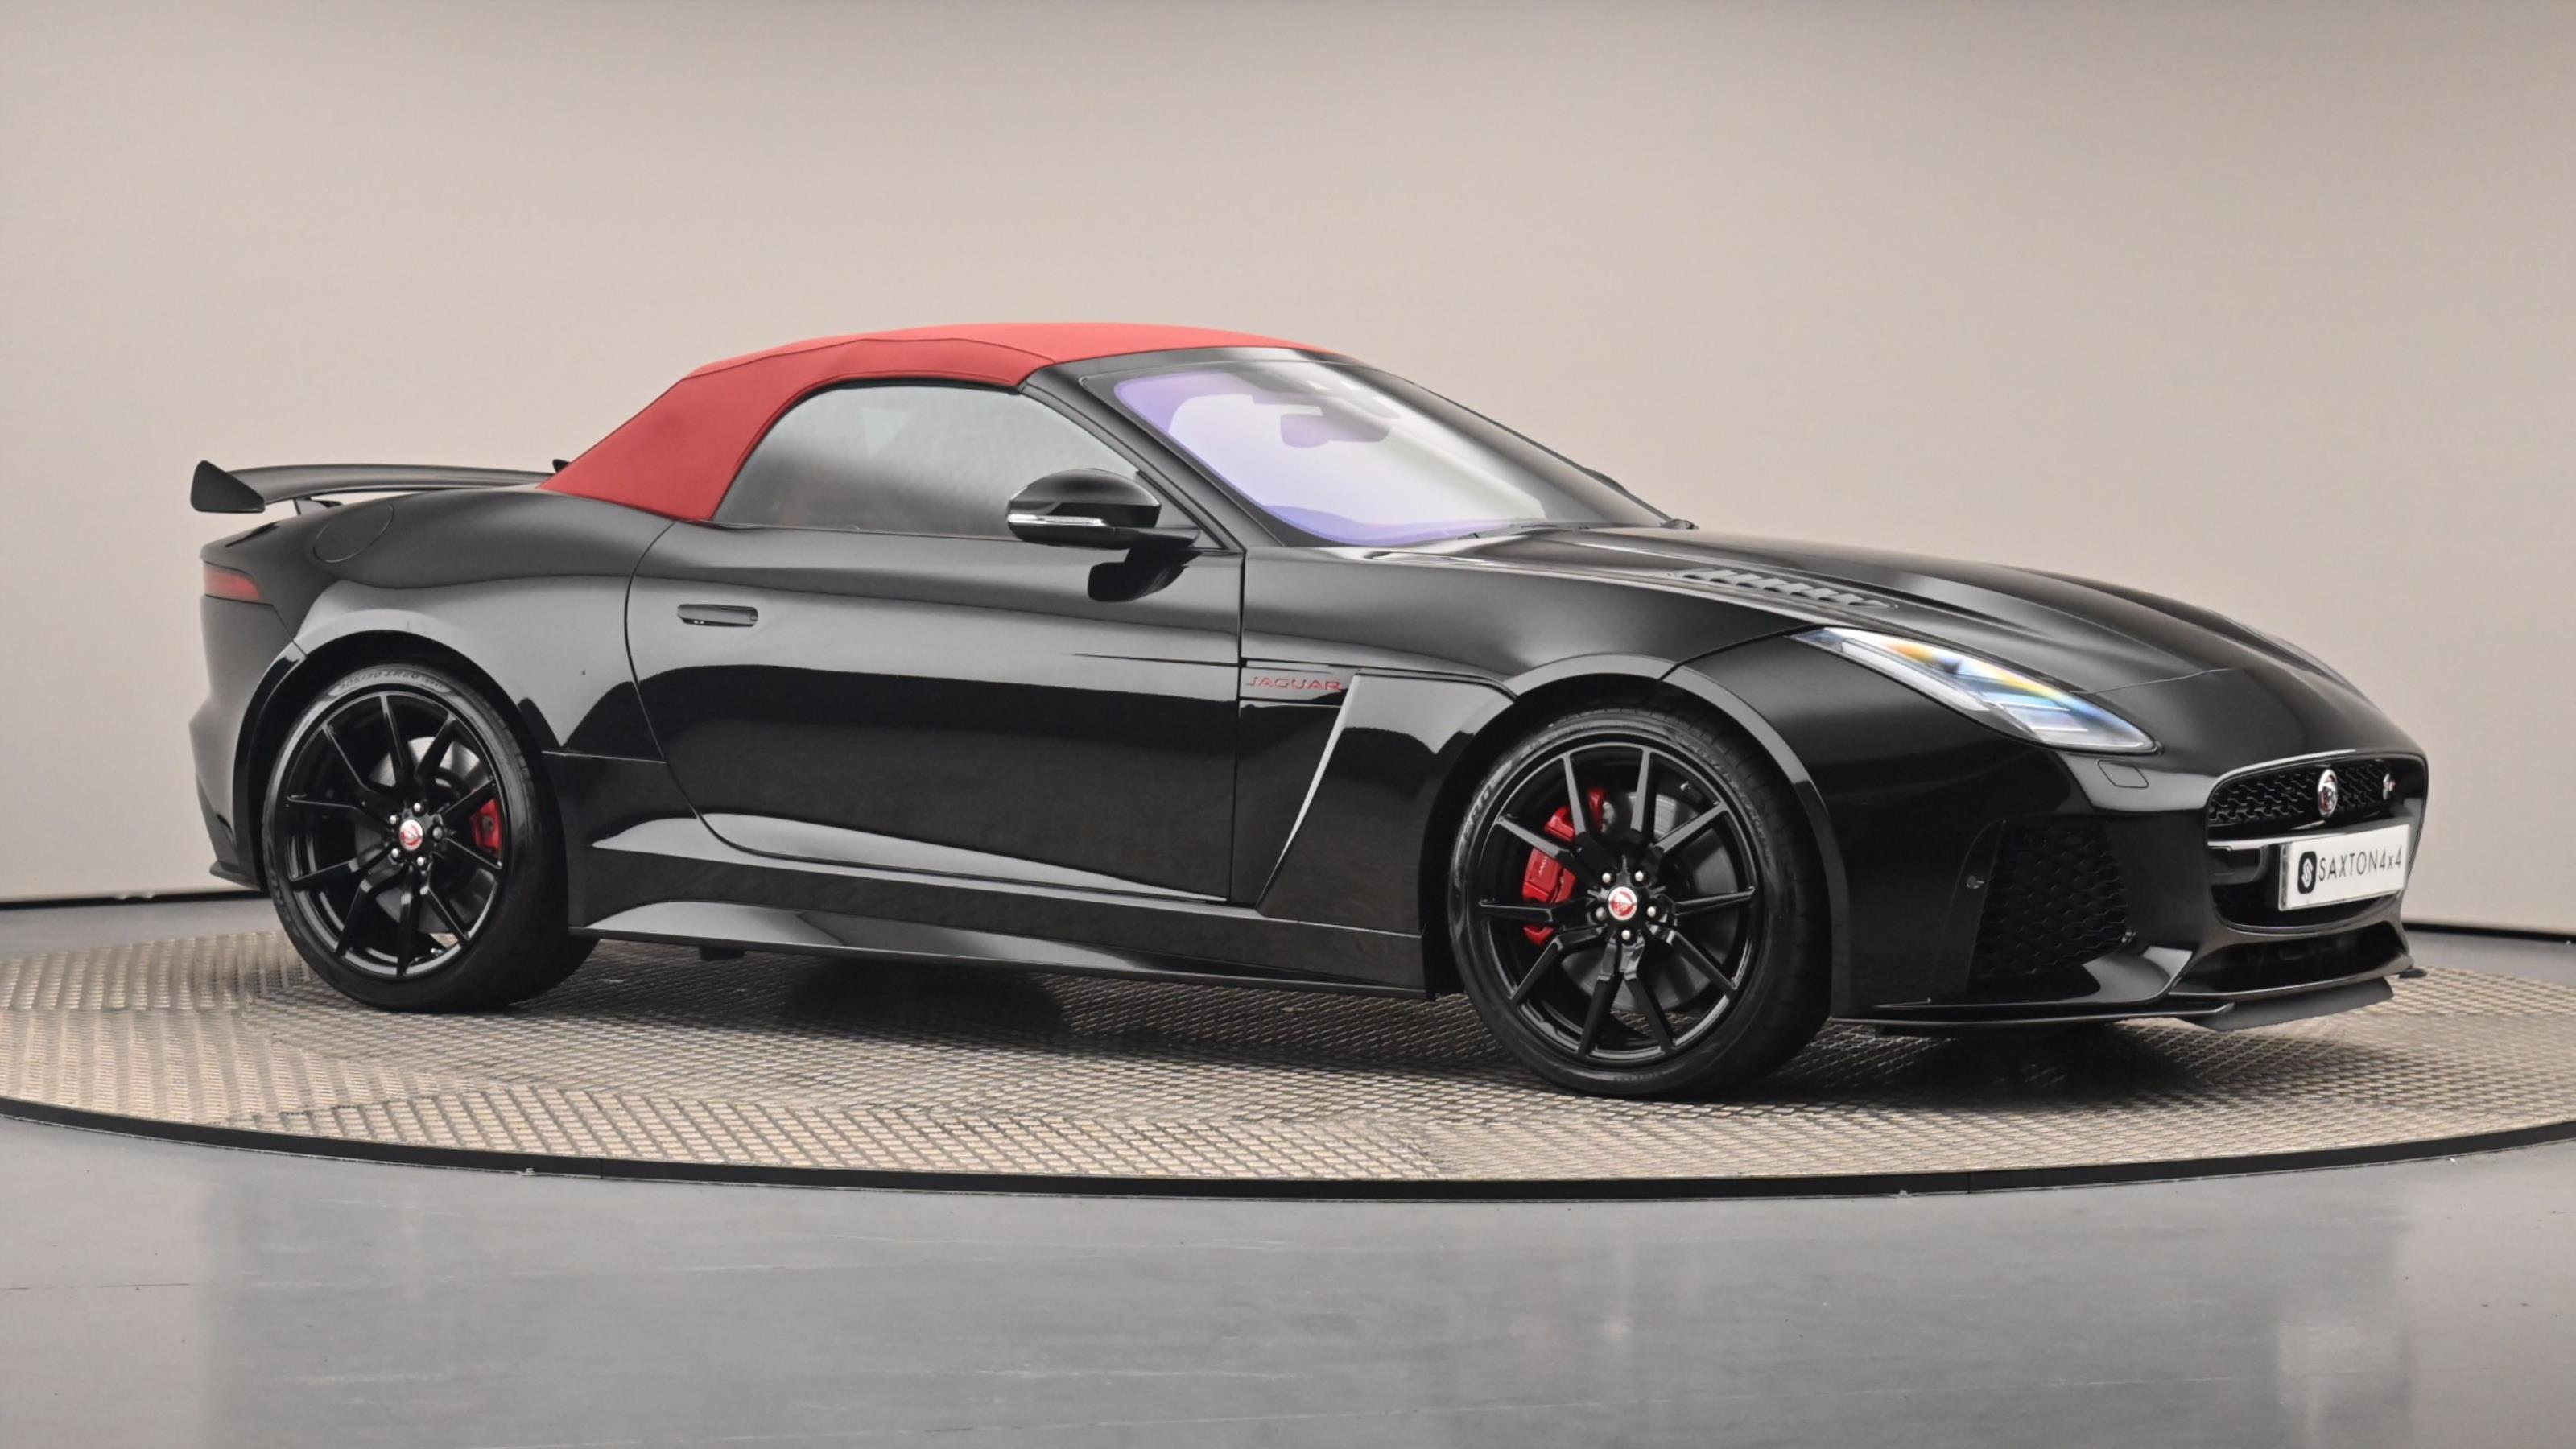 Used 2017 Jaguar F-TYPE 5.0 Supercharged V8 SVR 2dr Auto AWD BLACK at Saxton4x4